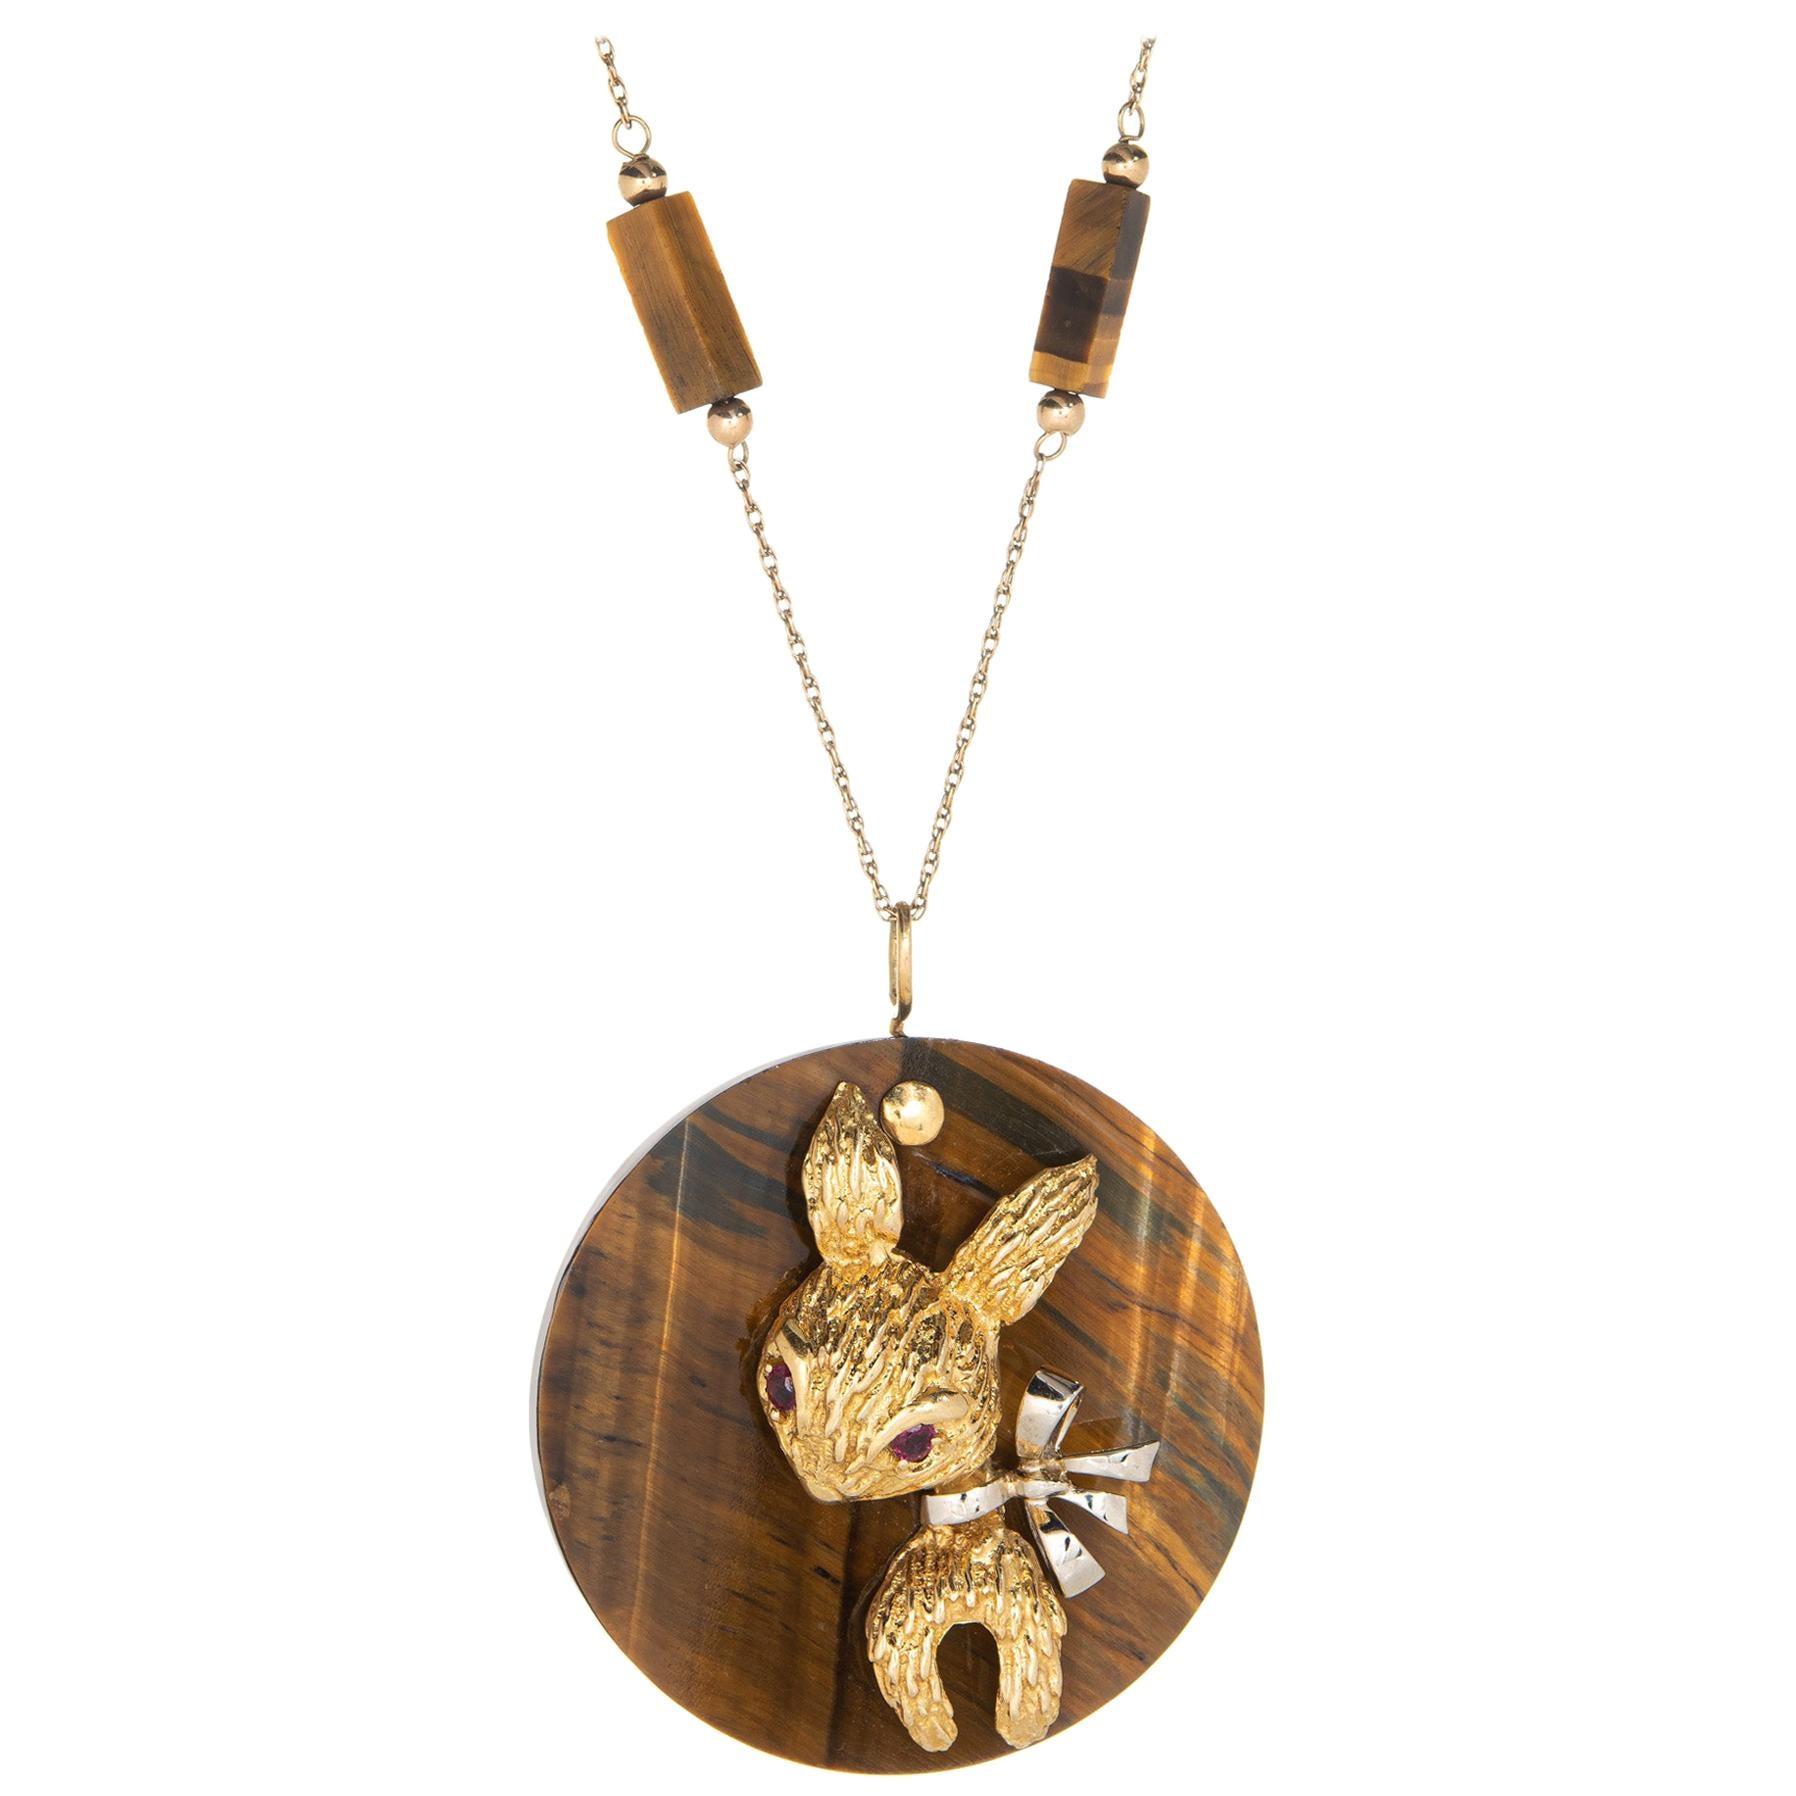 1970s Tigers Eye Rabbit Medallion Necklace Vintage 14 Karat Gold Animal Jewelry